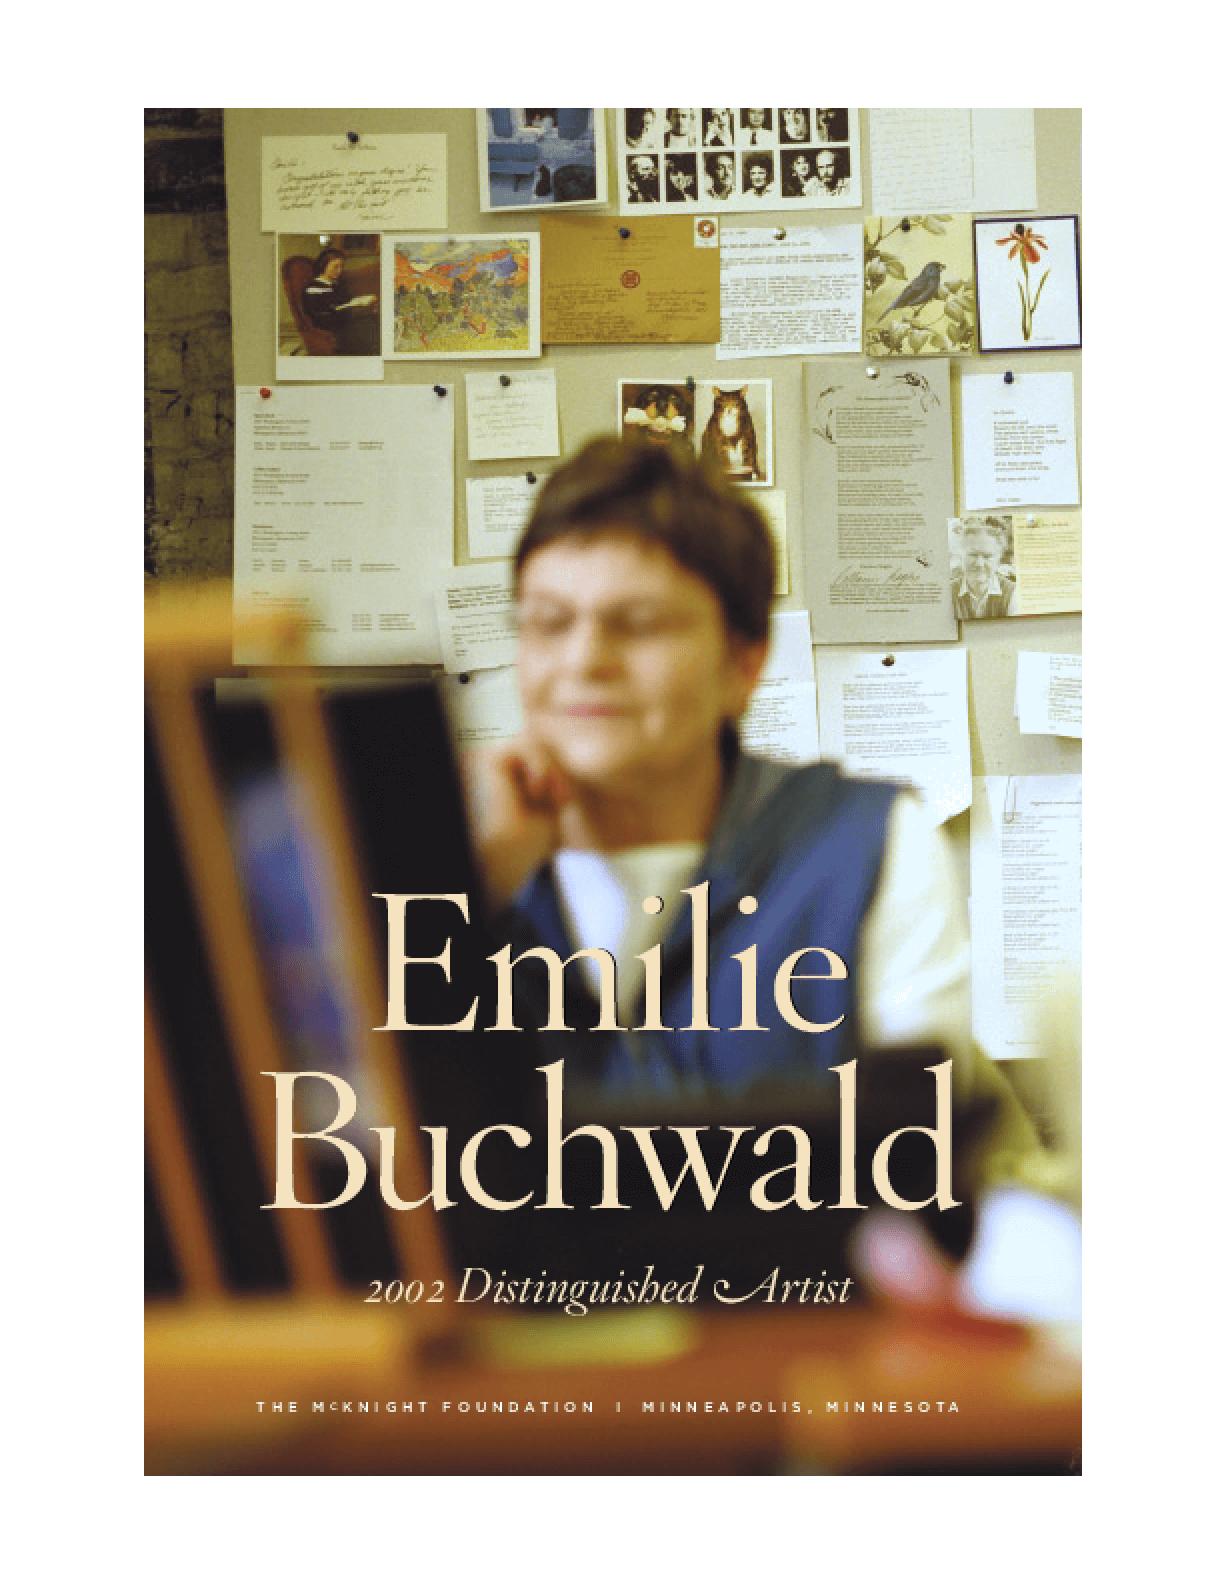 Emilie Buchwald: 2002 Distinguished Artist